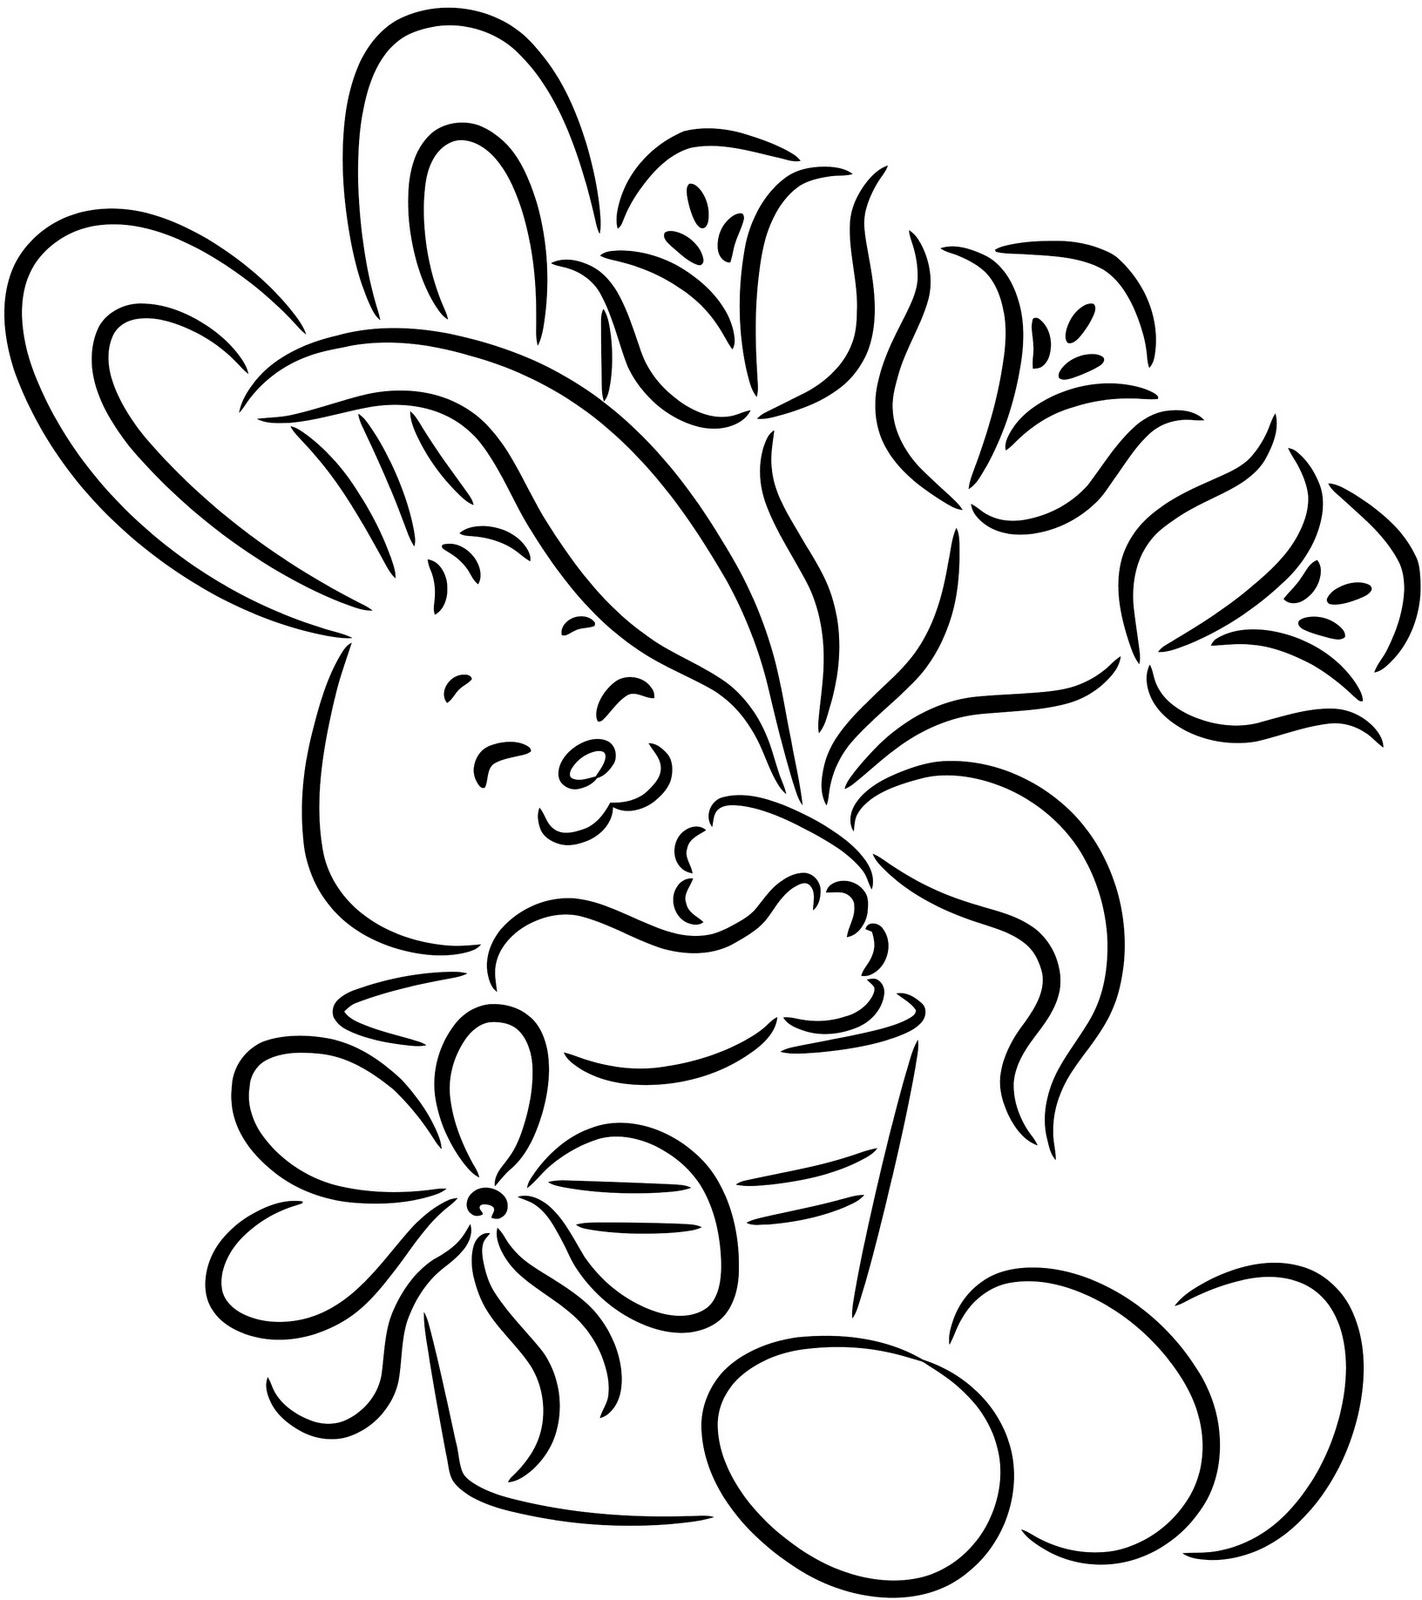 Fichas De Ingles Para Ninos Easter Bunny Coloring Pages